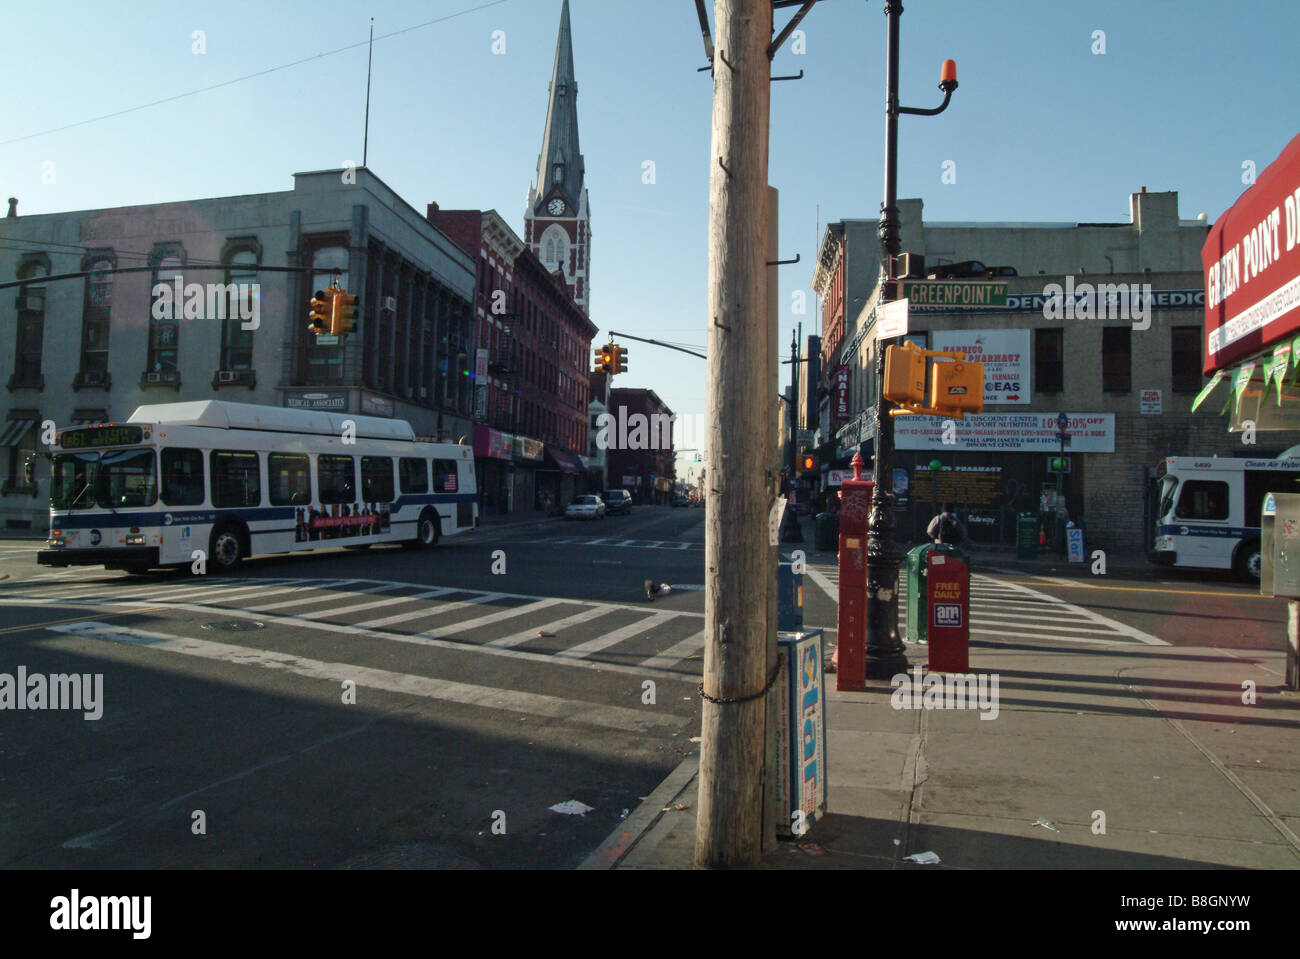 greenpoint, brooklyn, new york - Stock Image